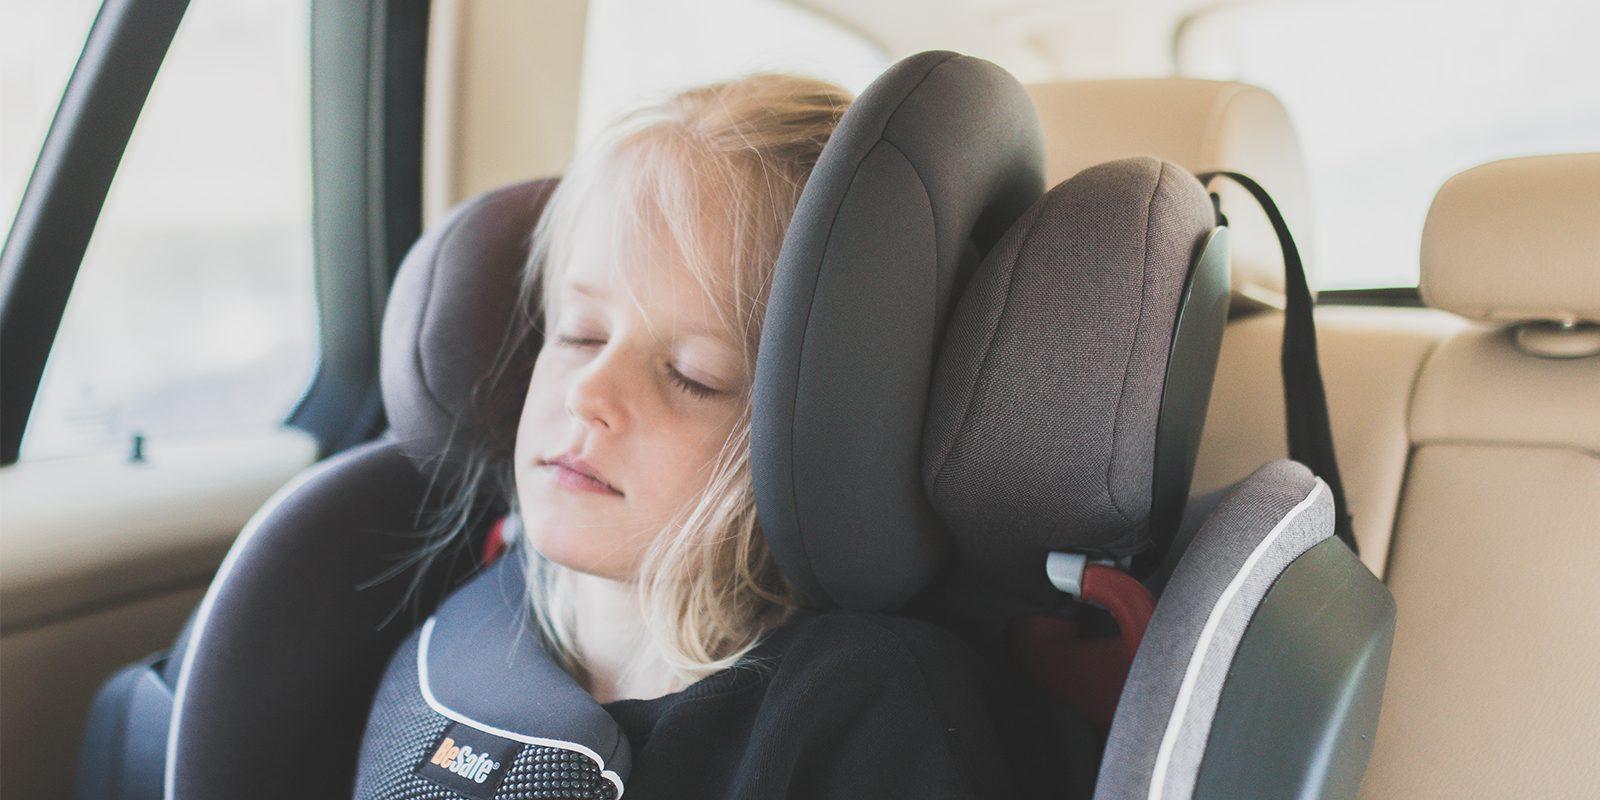 tips for a safer journey